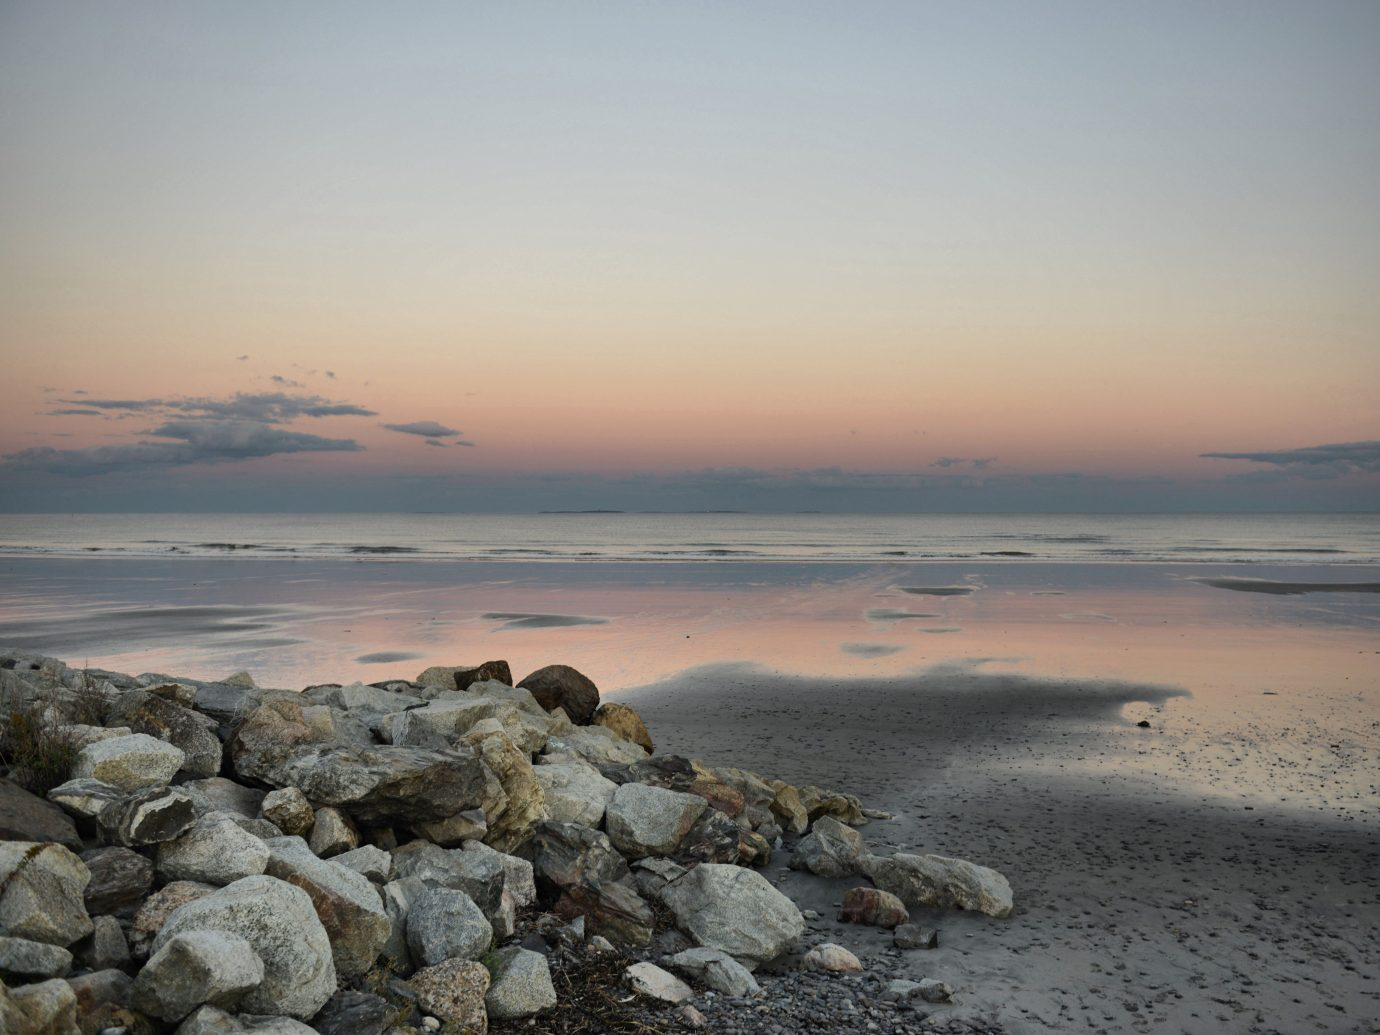 Autumn sunset on Rye Beach New Hampshire, USA